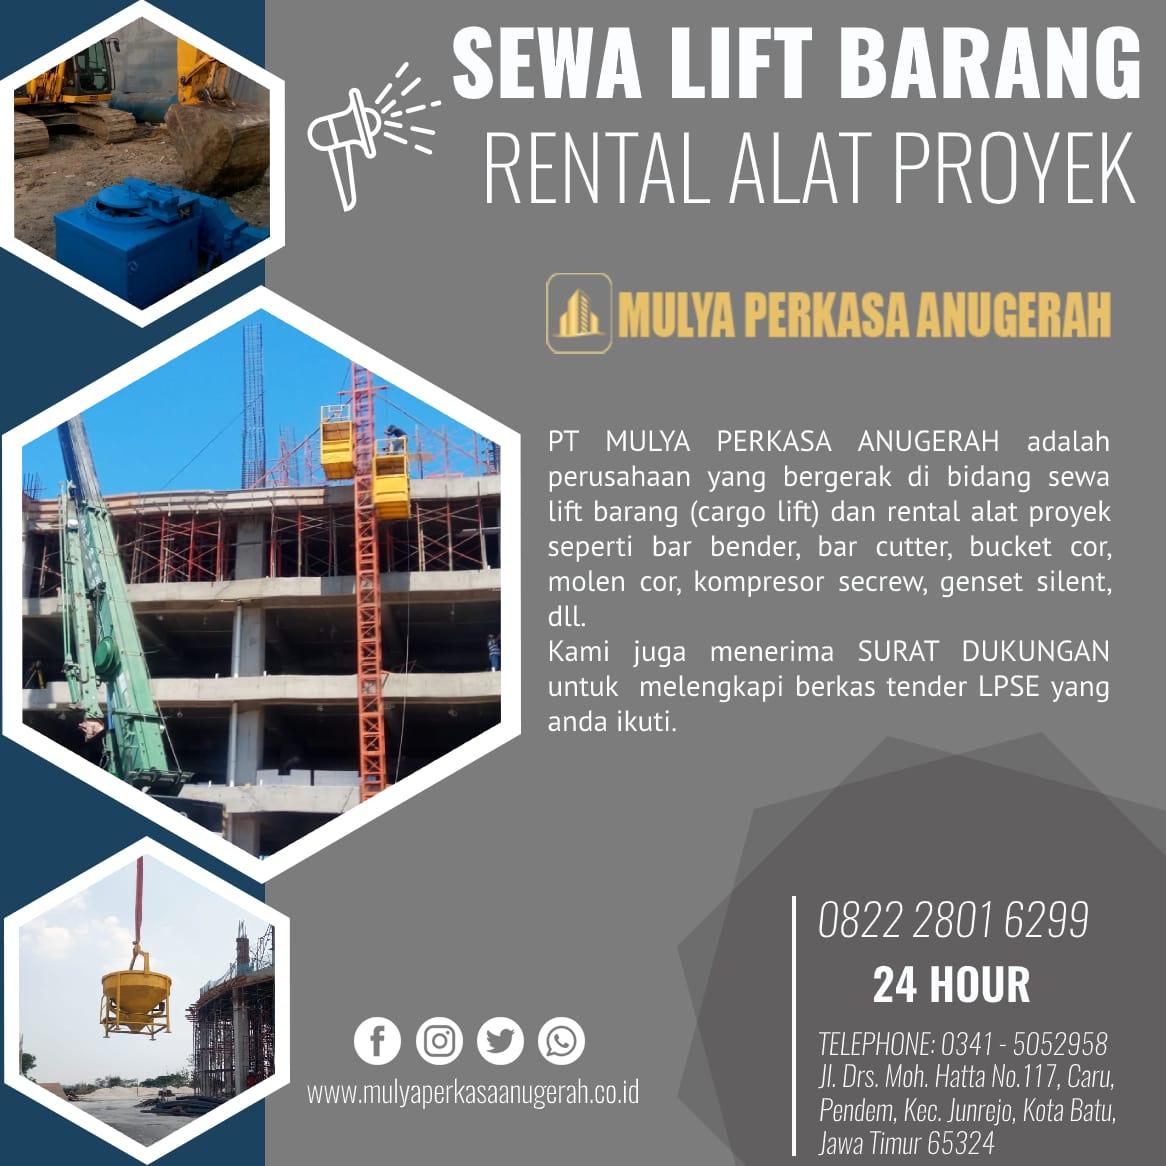 sewa-lift-barang-lift-proyek-lift-cargo-082228016299